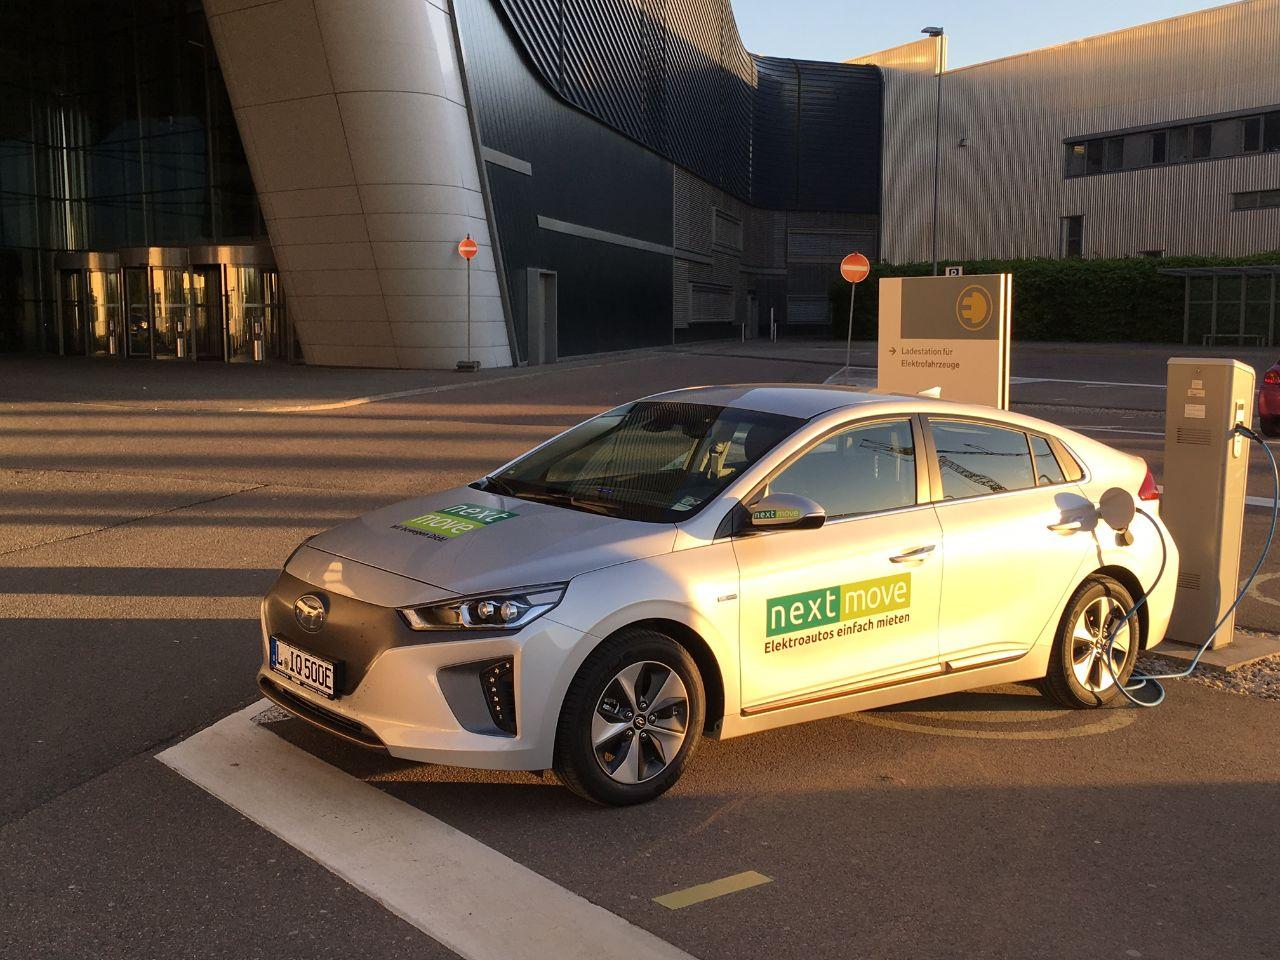 Hyundai IONIQ mieten bei nextmove.de